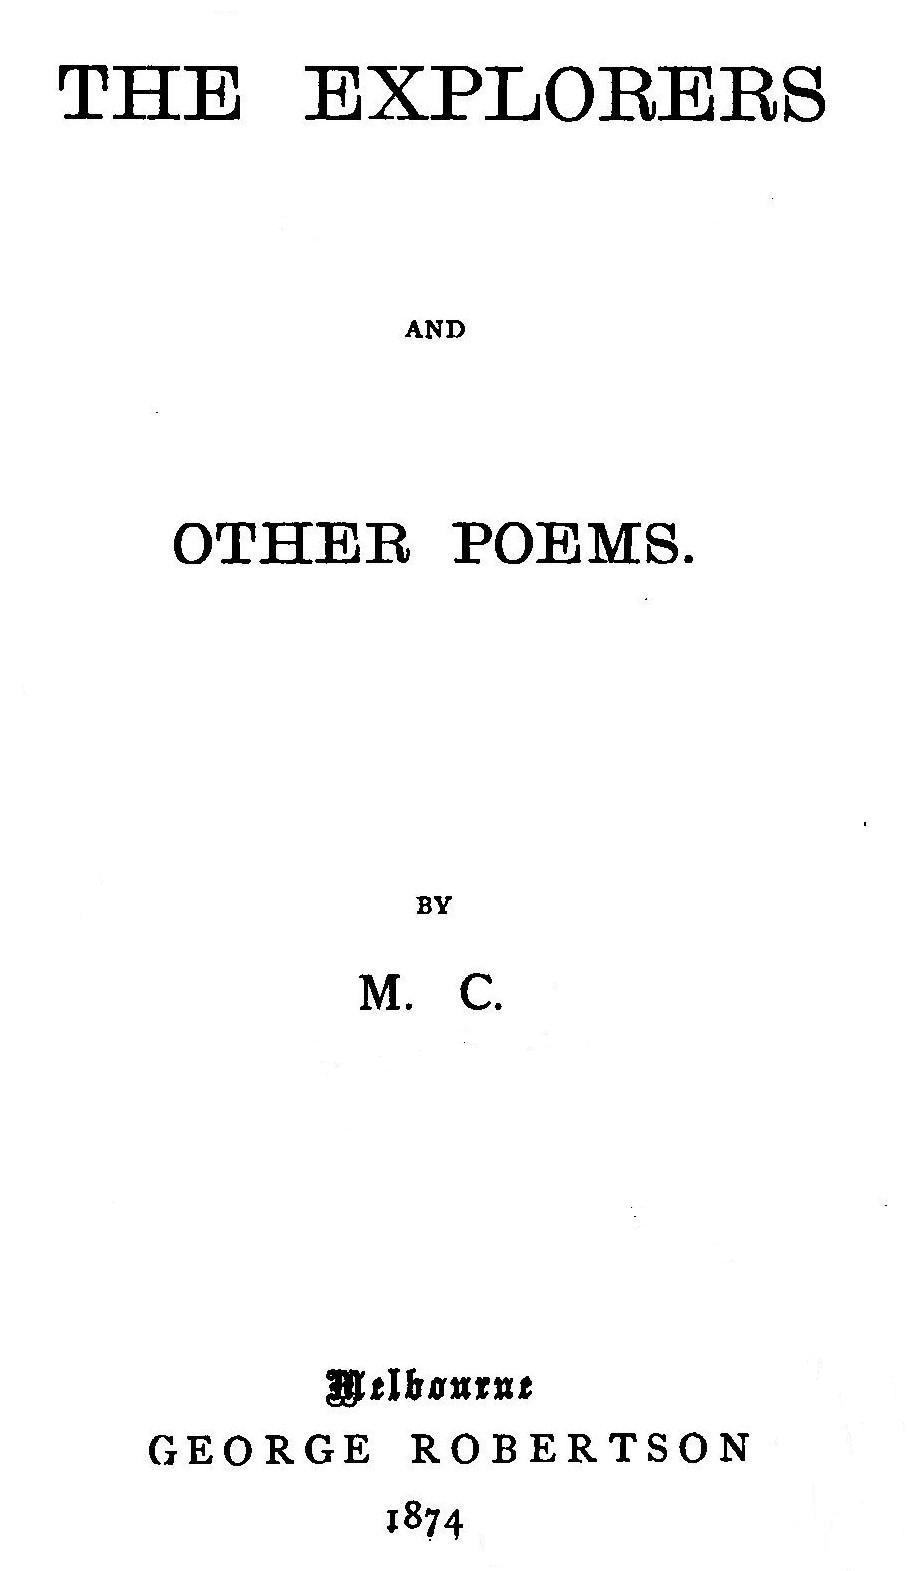 Catherine Edith Macauley Martin